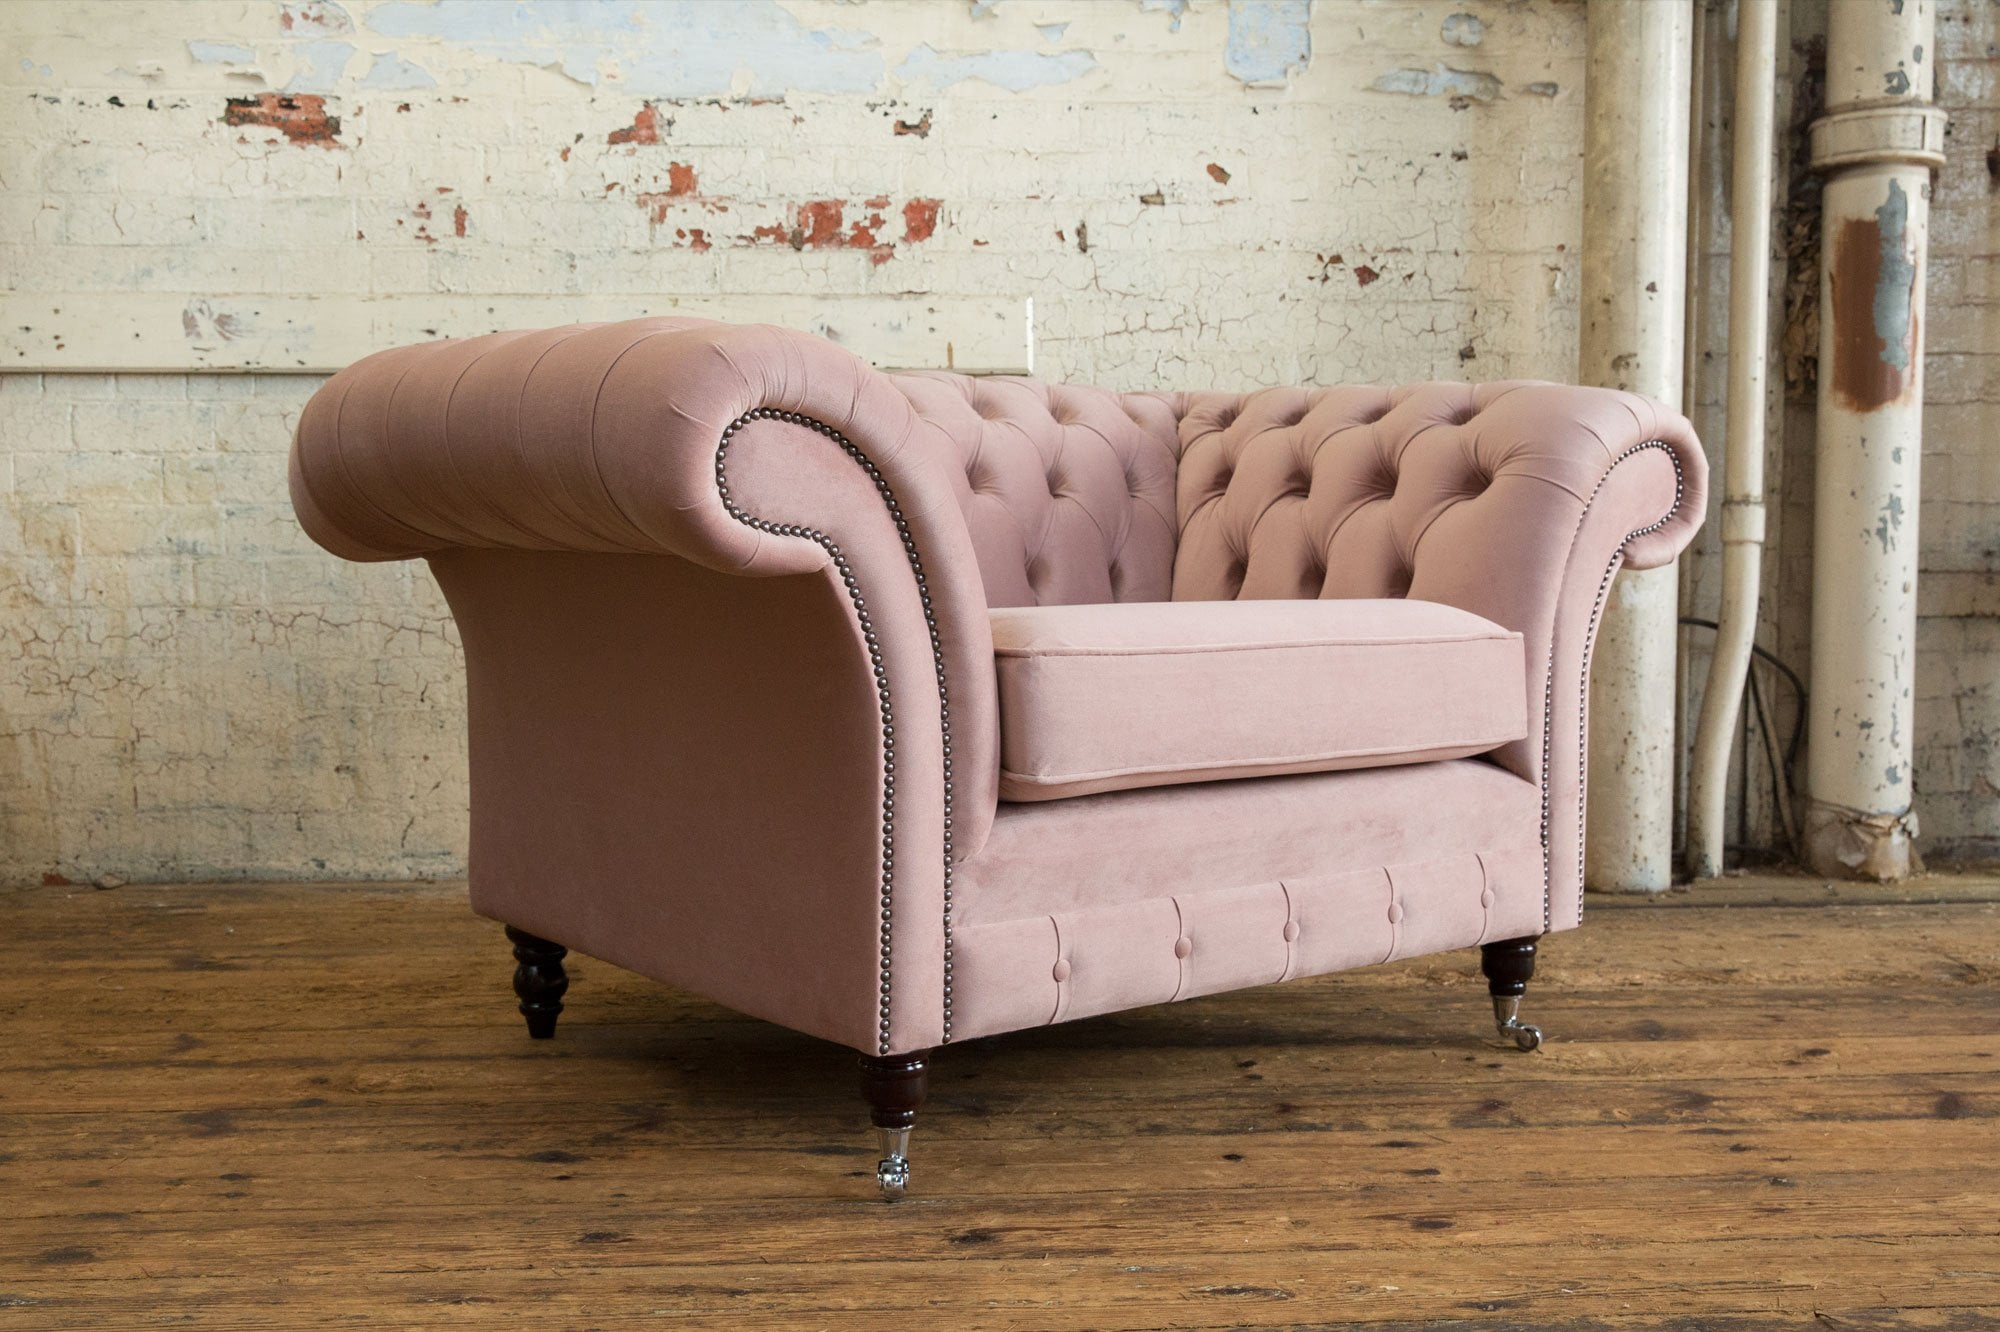 woodstock chesterfield armchair house dusty pink velvet p103 884 zoom